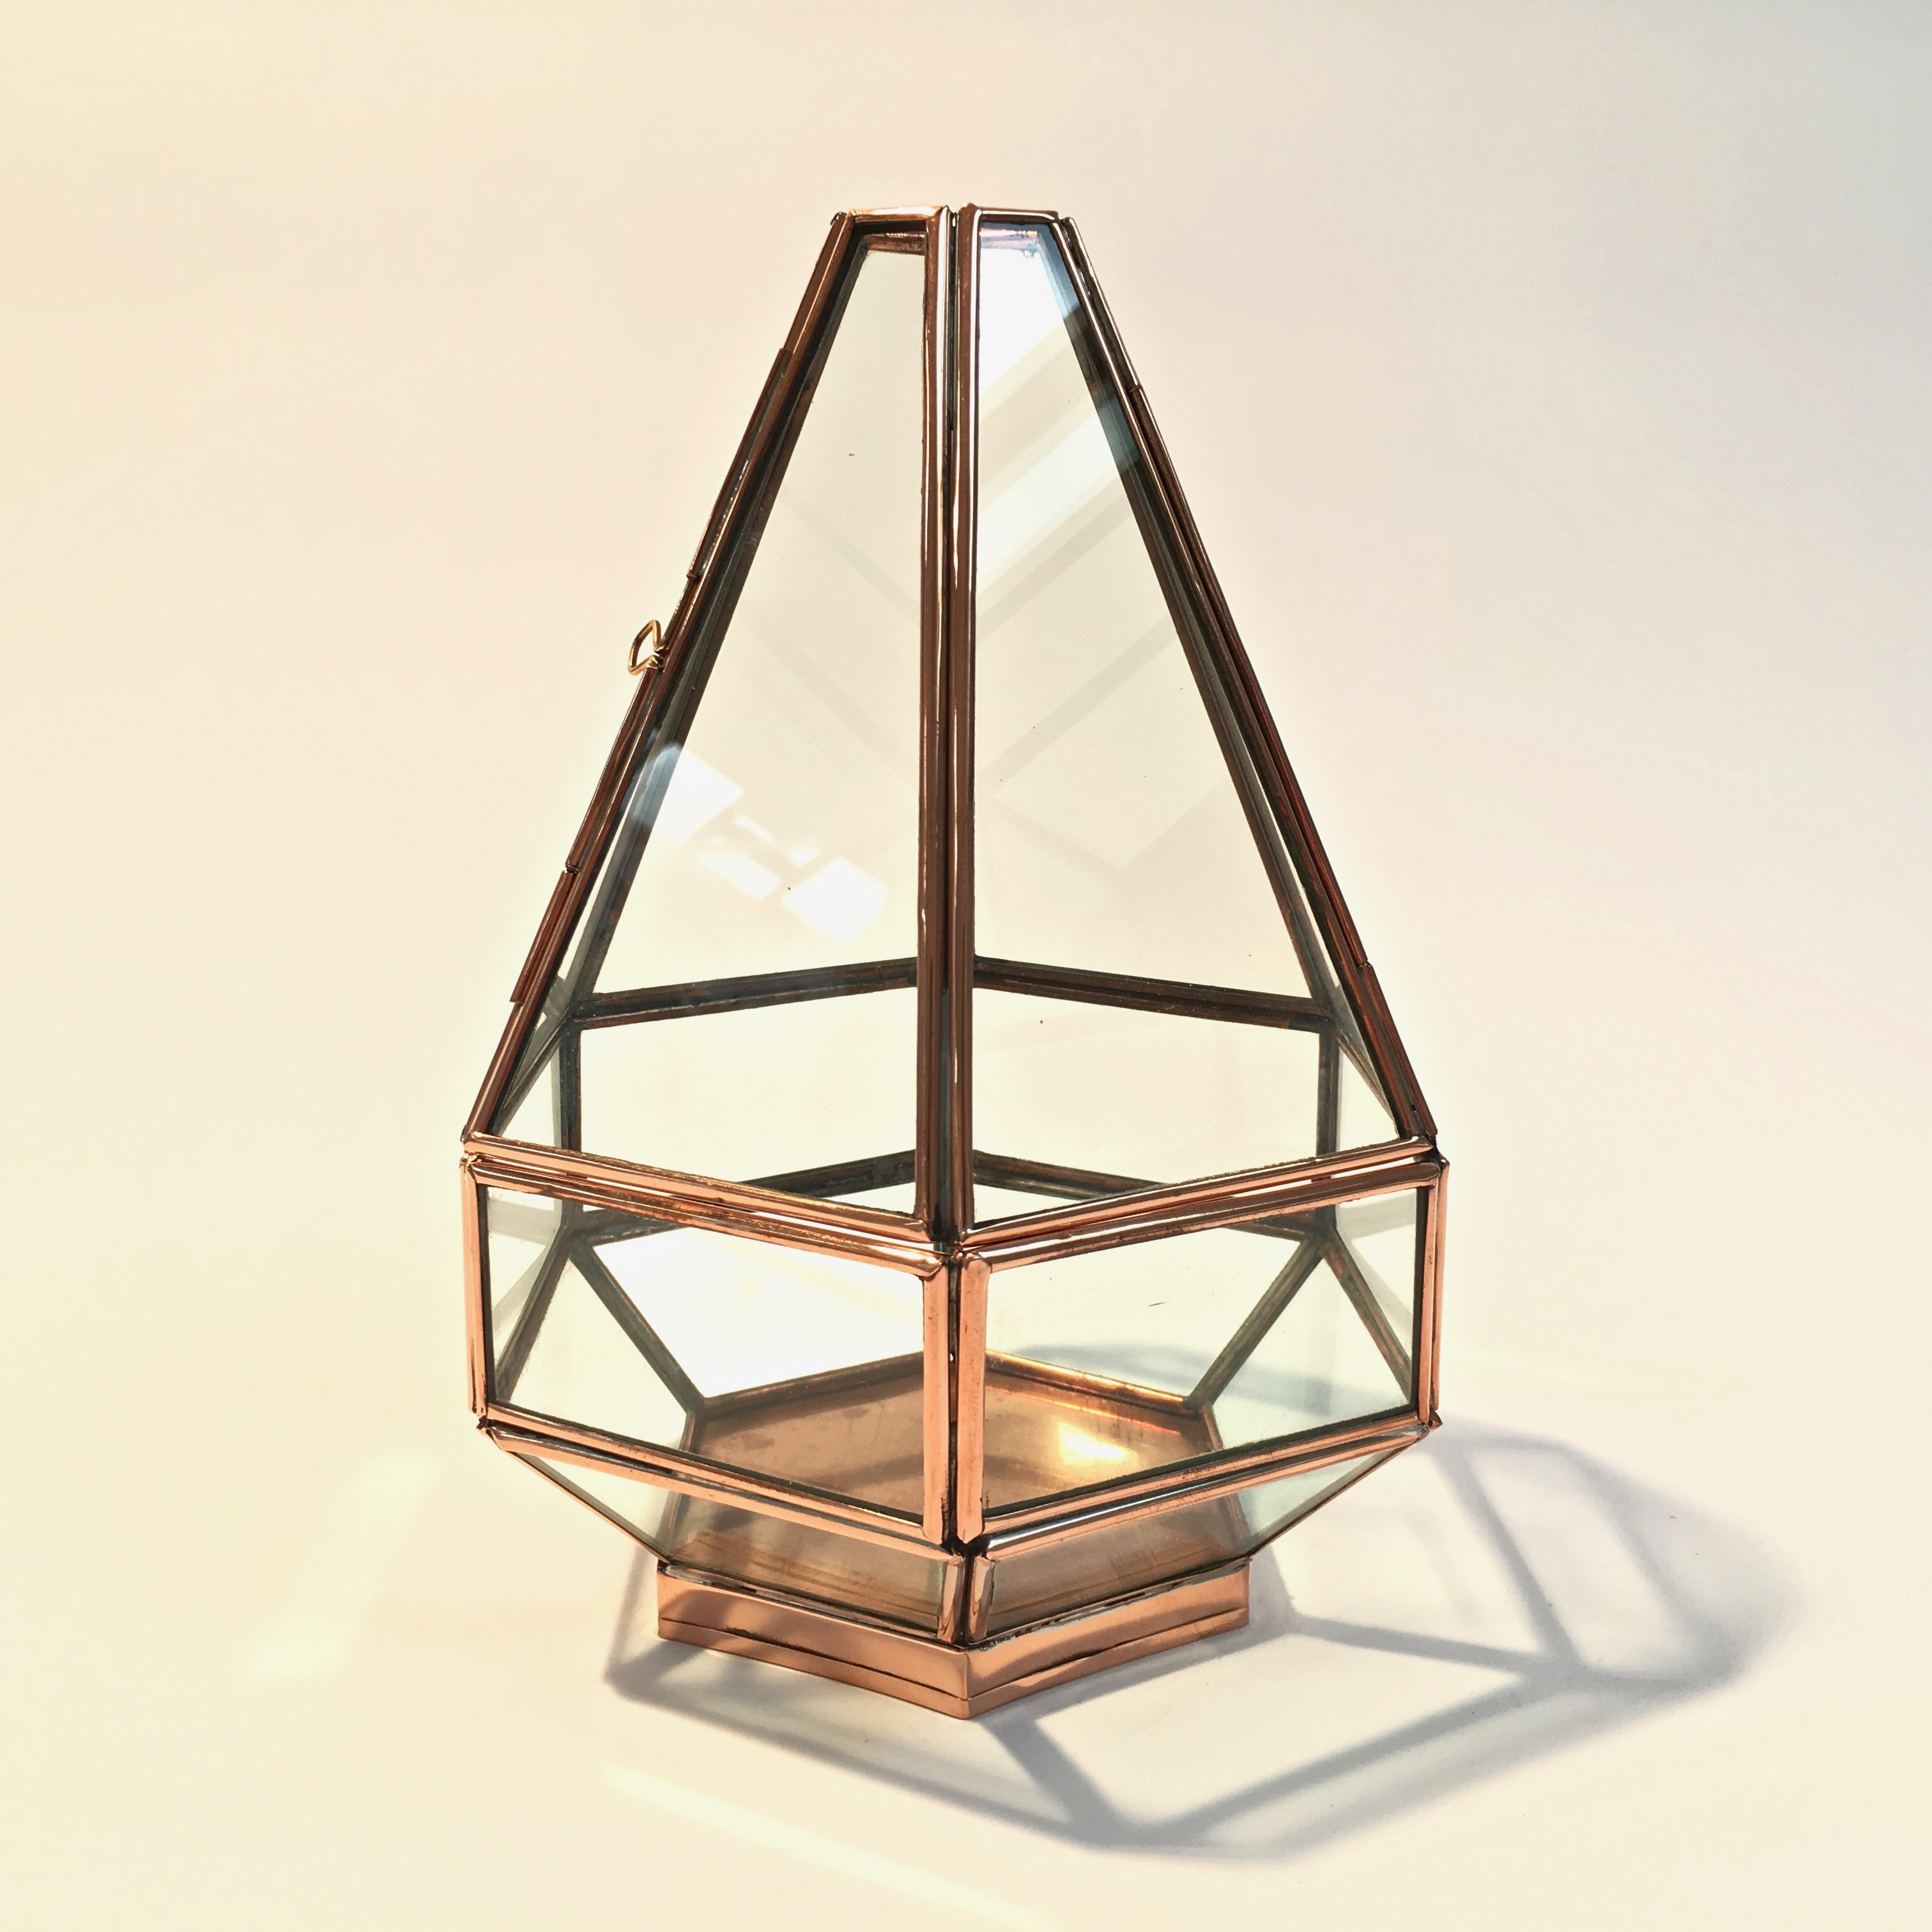 boite_cuivre_verre_hexagonale_liedekerke_maison-lk_2